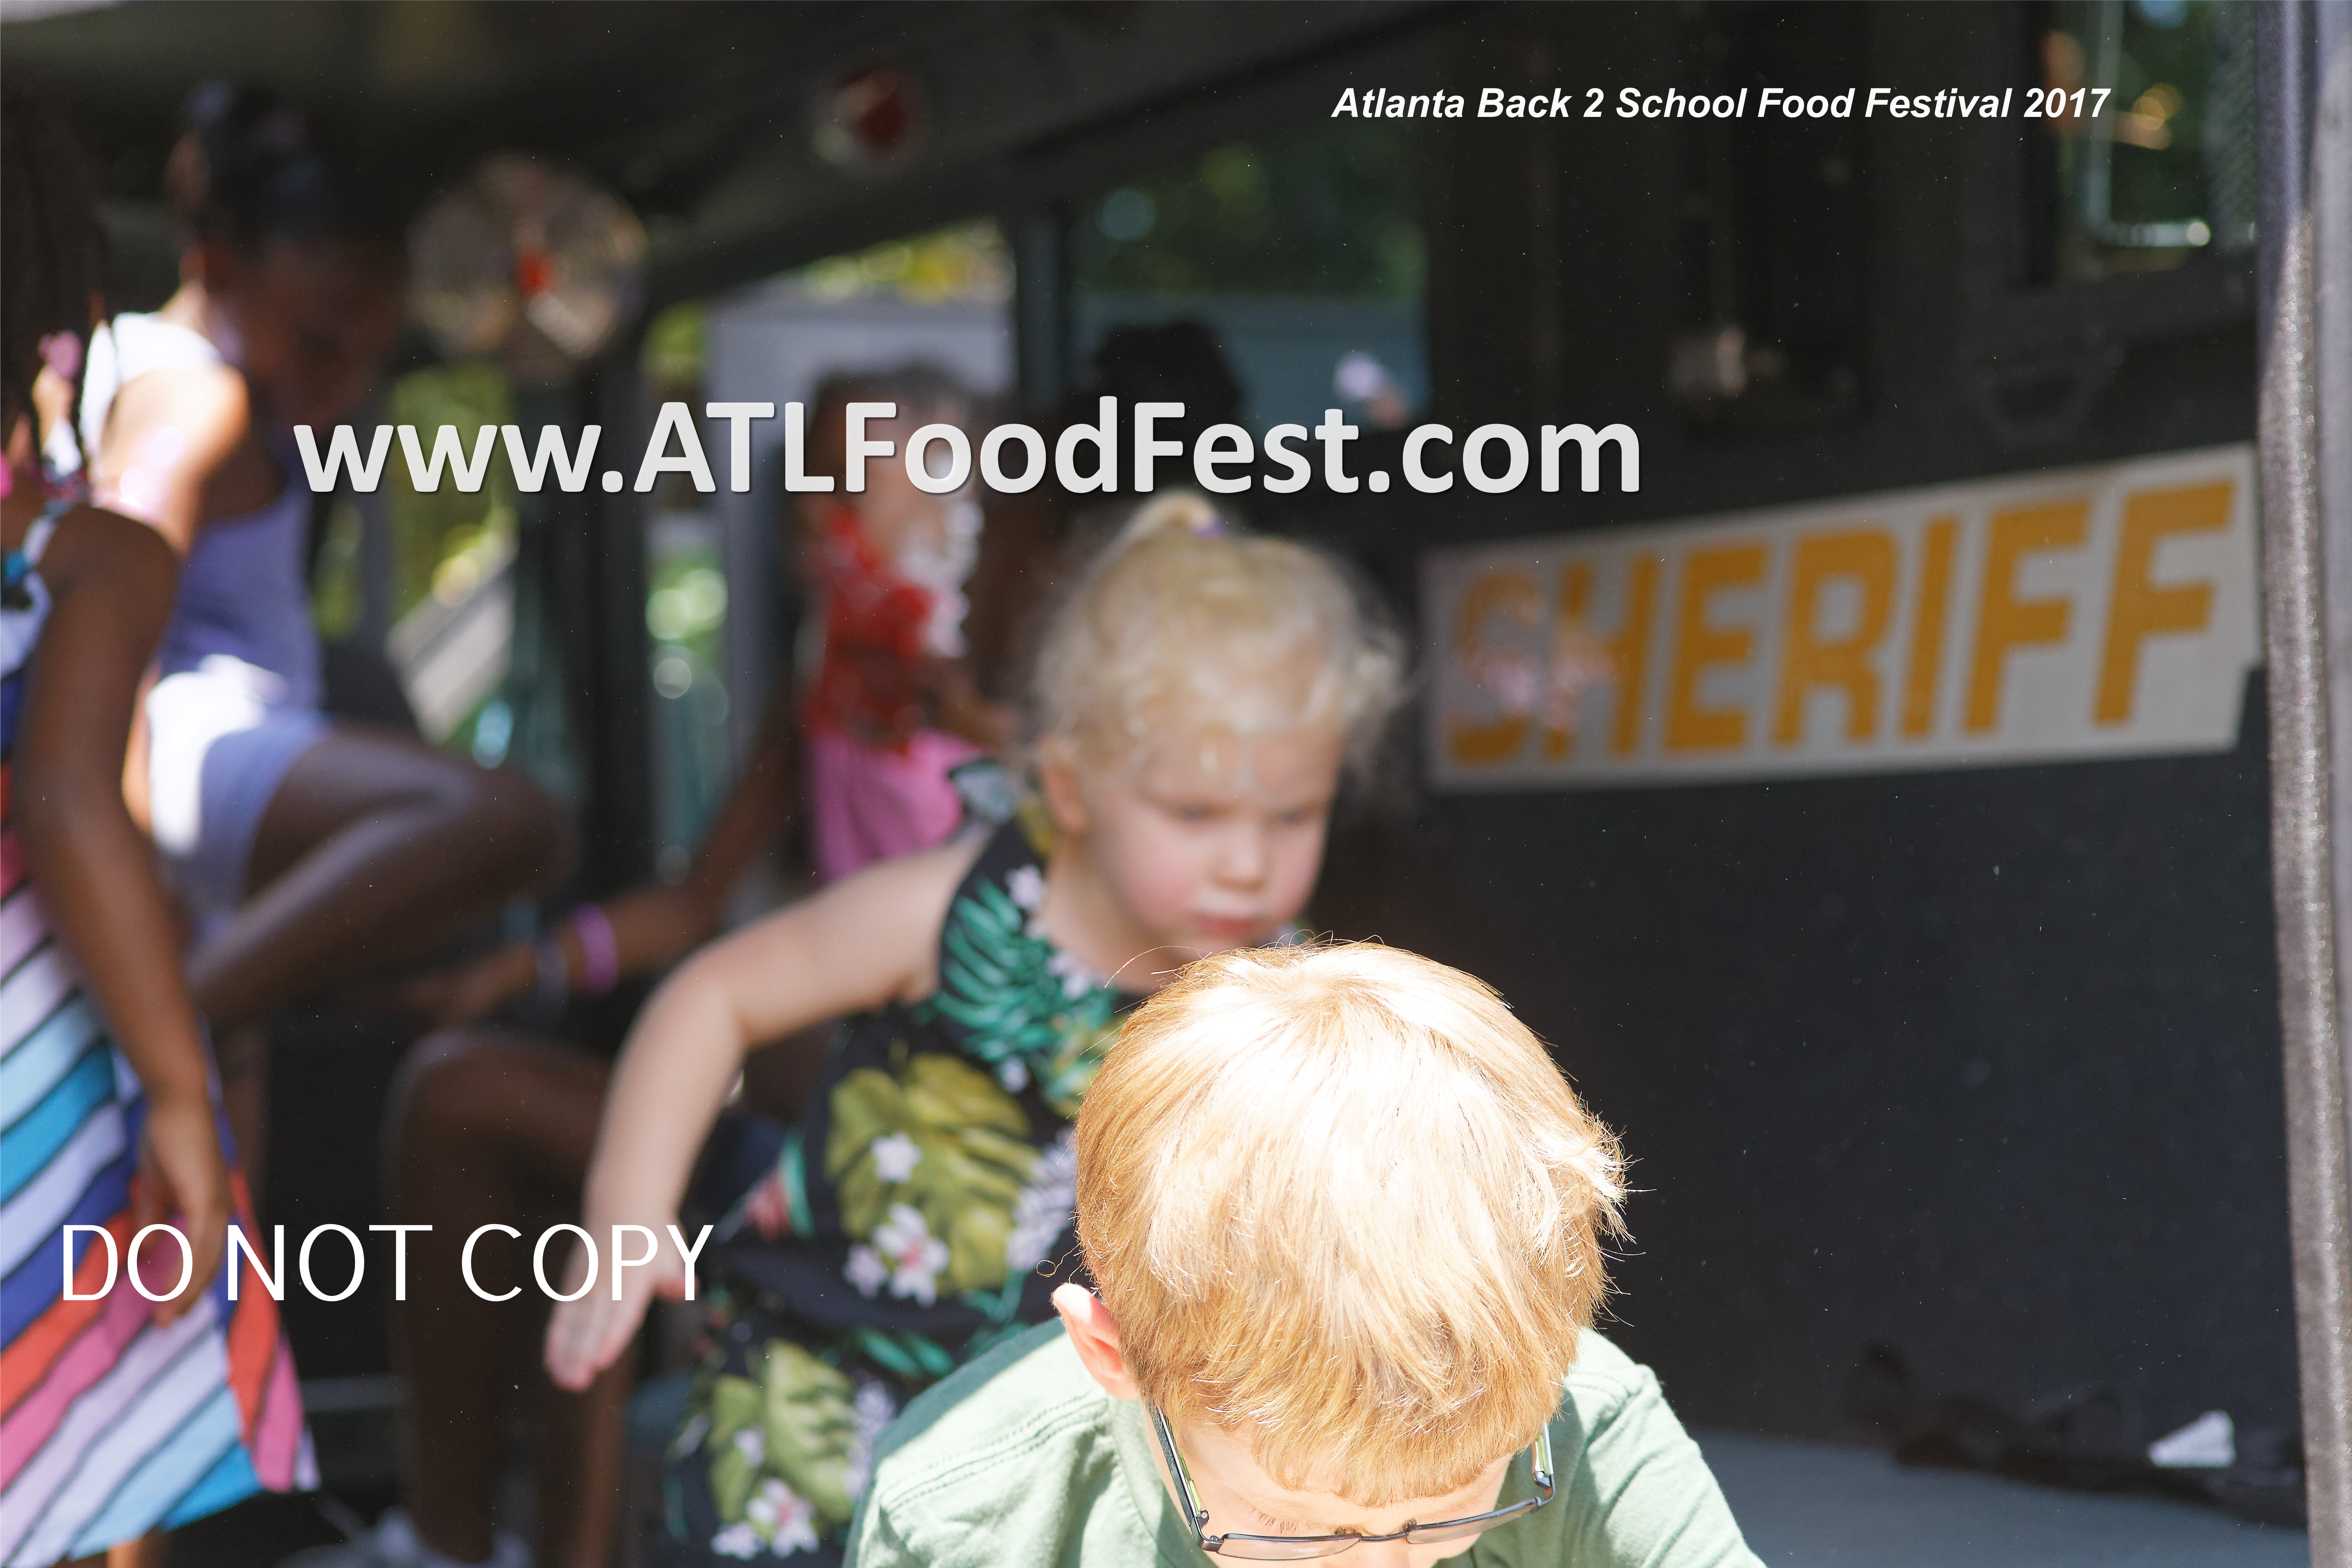 Atlanta Touch a Truck Festival